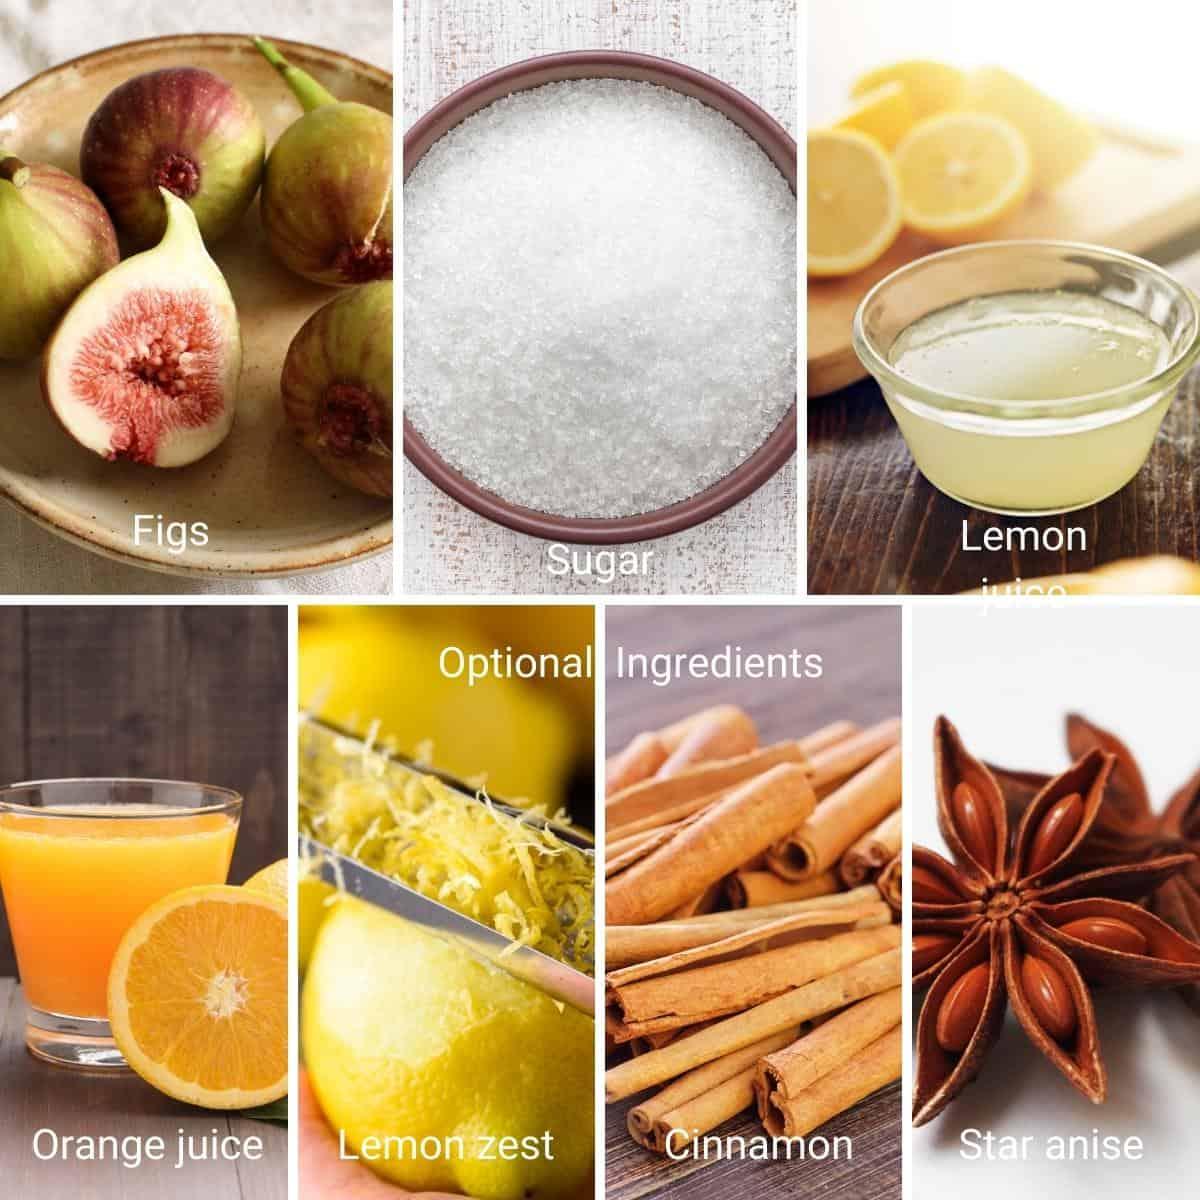 Ingredients shot collage for fig jam.